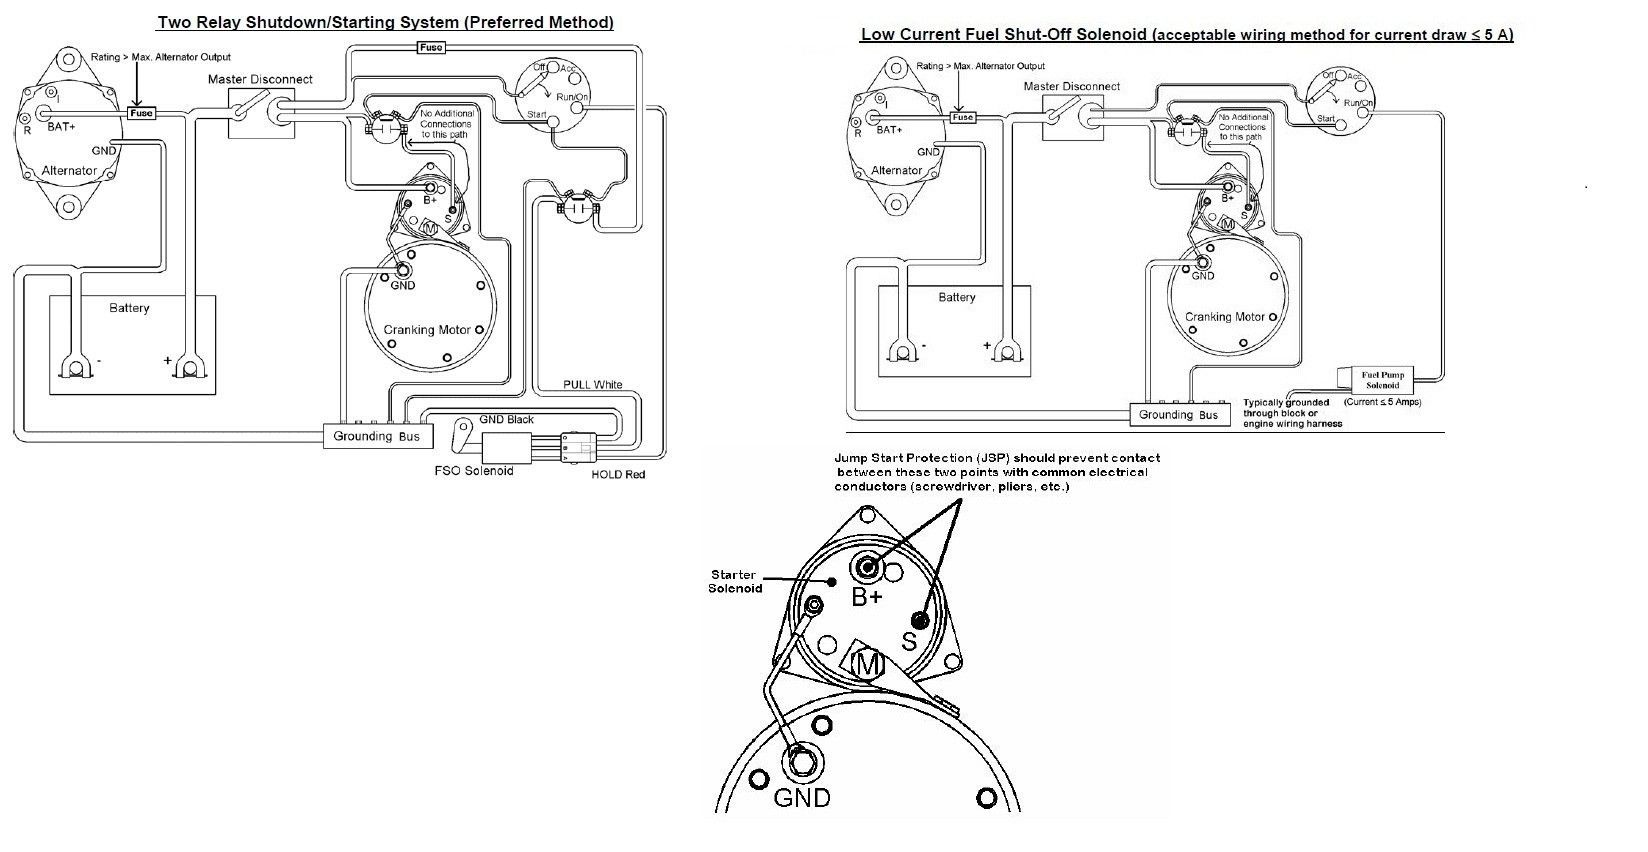 Cummins Fuel Shut Off Solenoid Wiring Diagram In 2020 Automotive Electrical Diagram Electrical Wiring Diagram